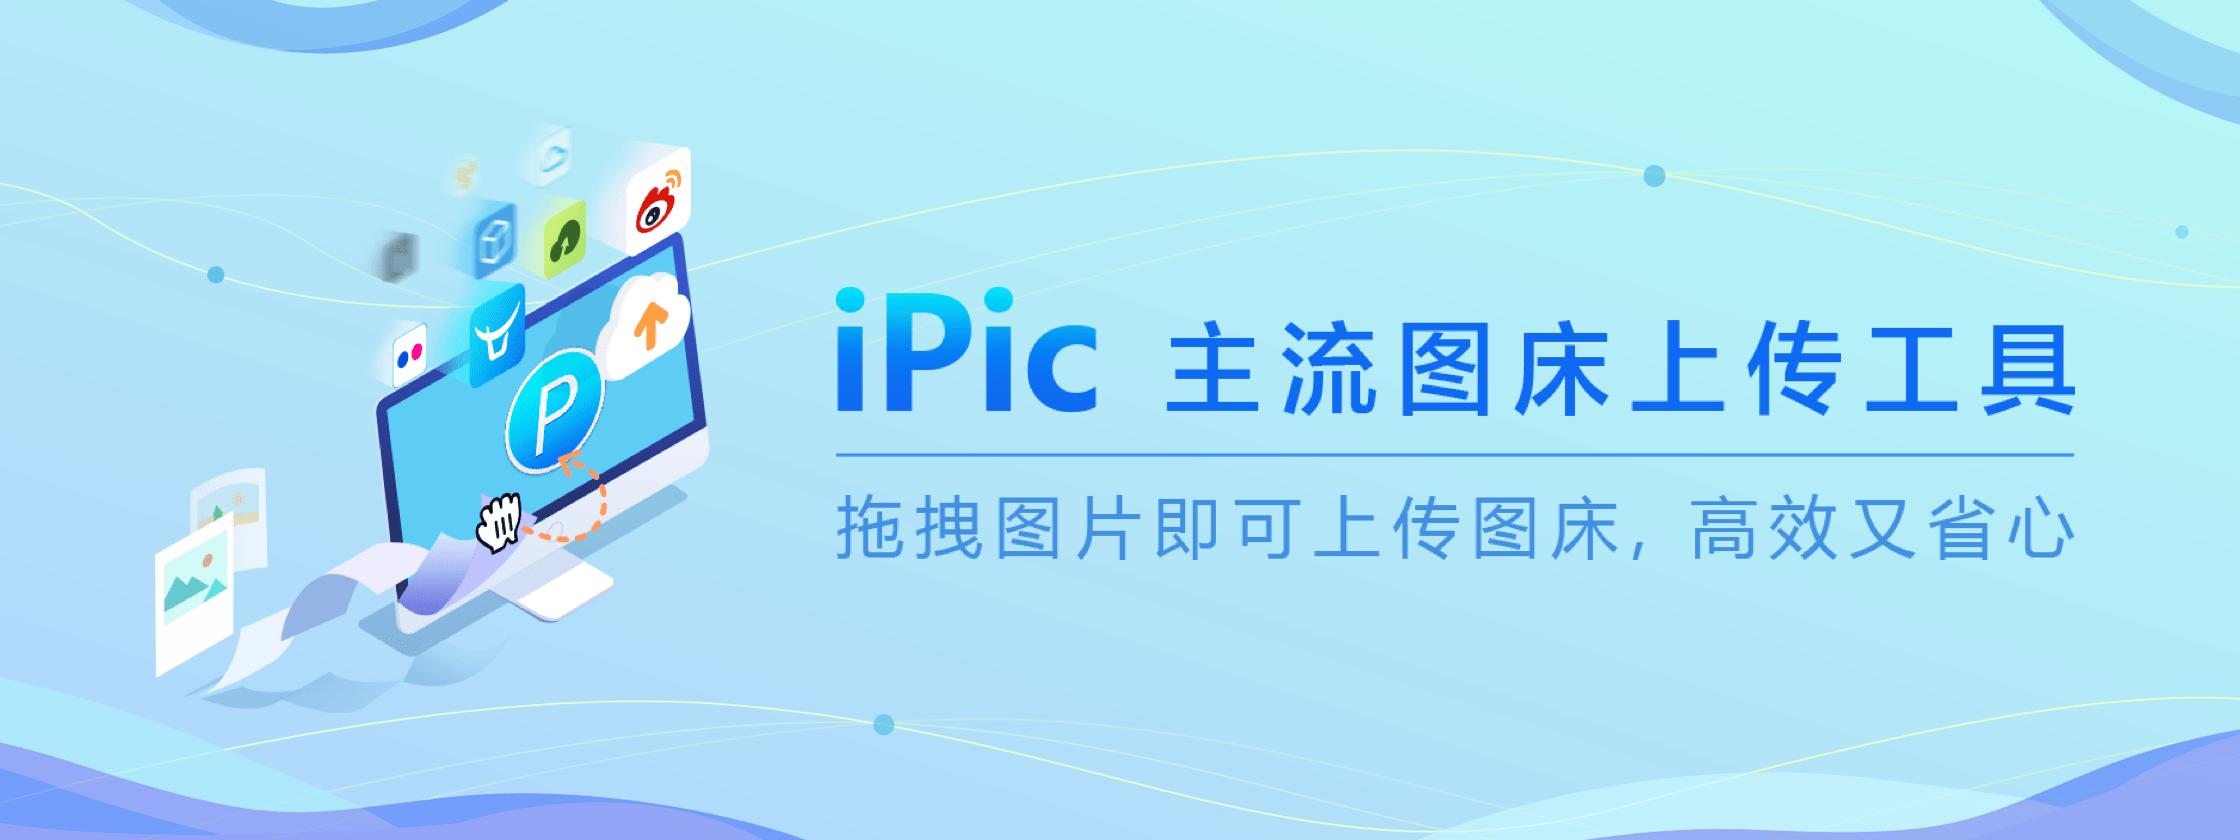 iPic – macOS 平台上好用的图床、文件上传工具